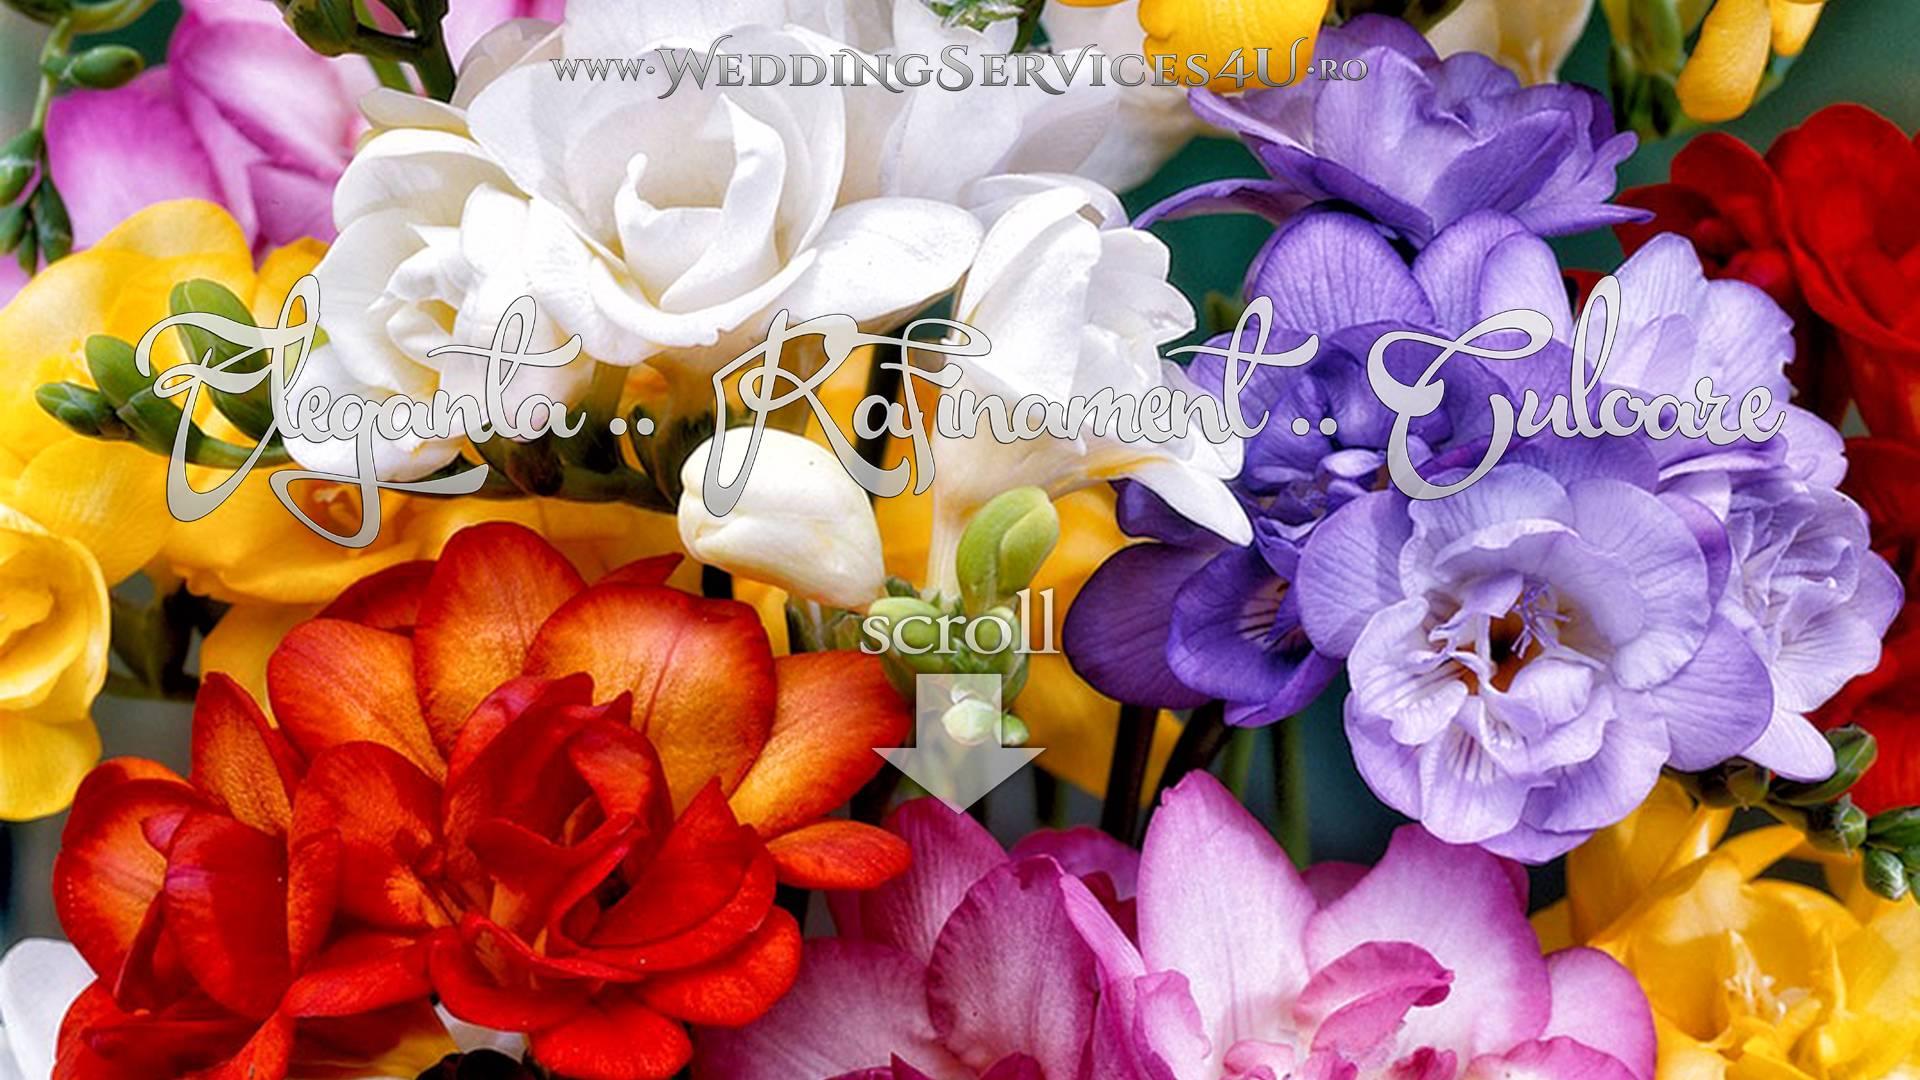 WeddingServices4U.ro Flori pentru Nunta si Botez, Buchete si Lumanari, Decoratiuni si Aranjamente Florale